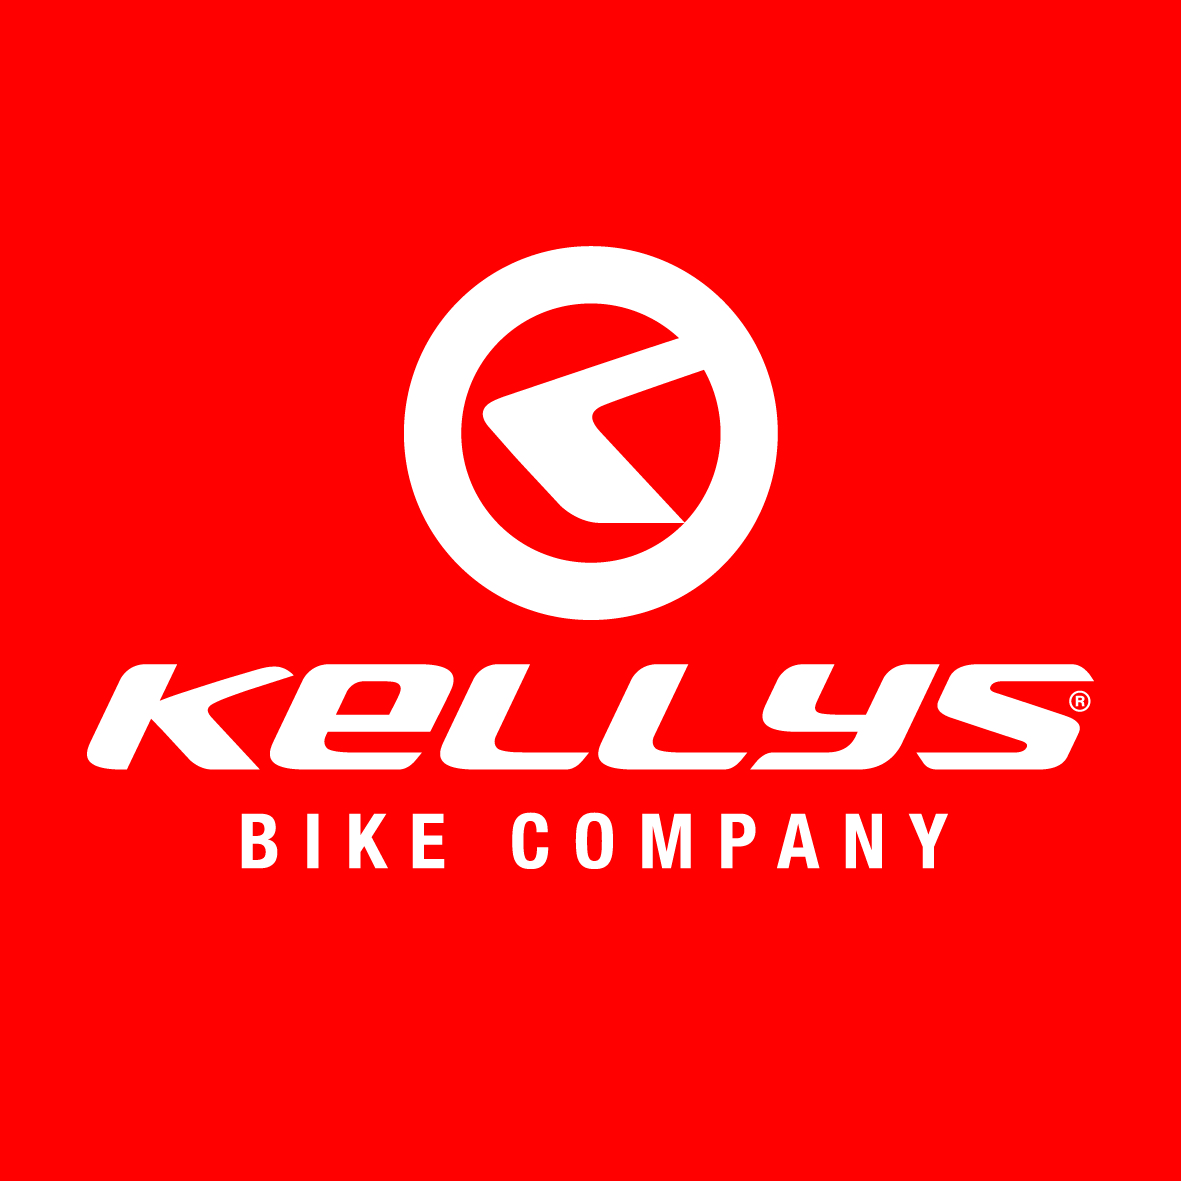 KELLLYS